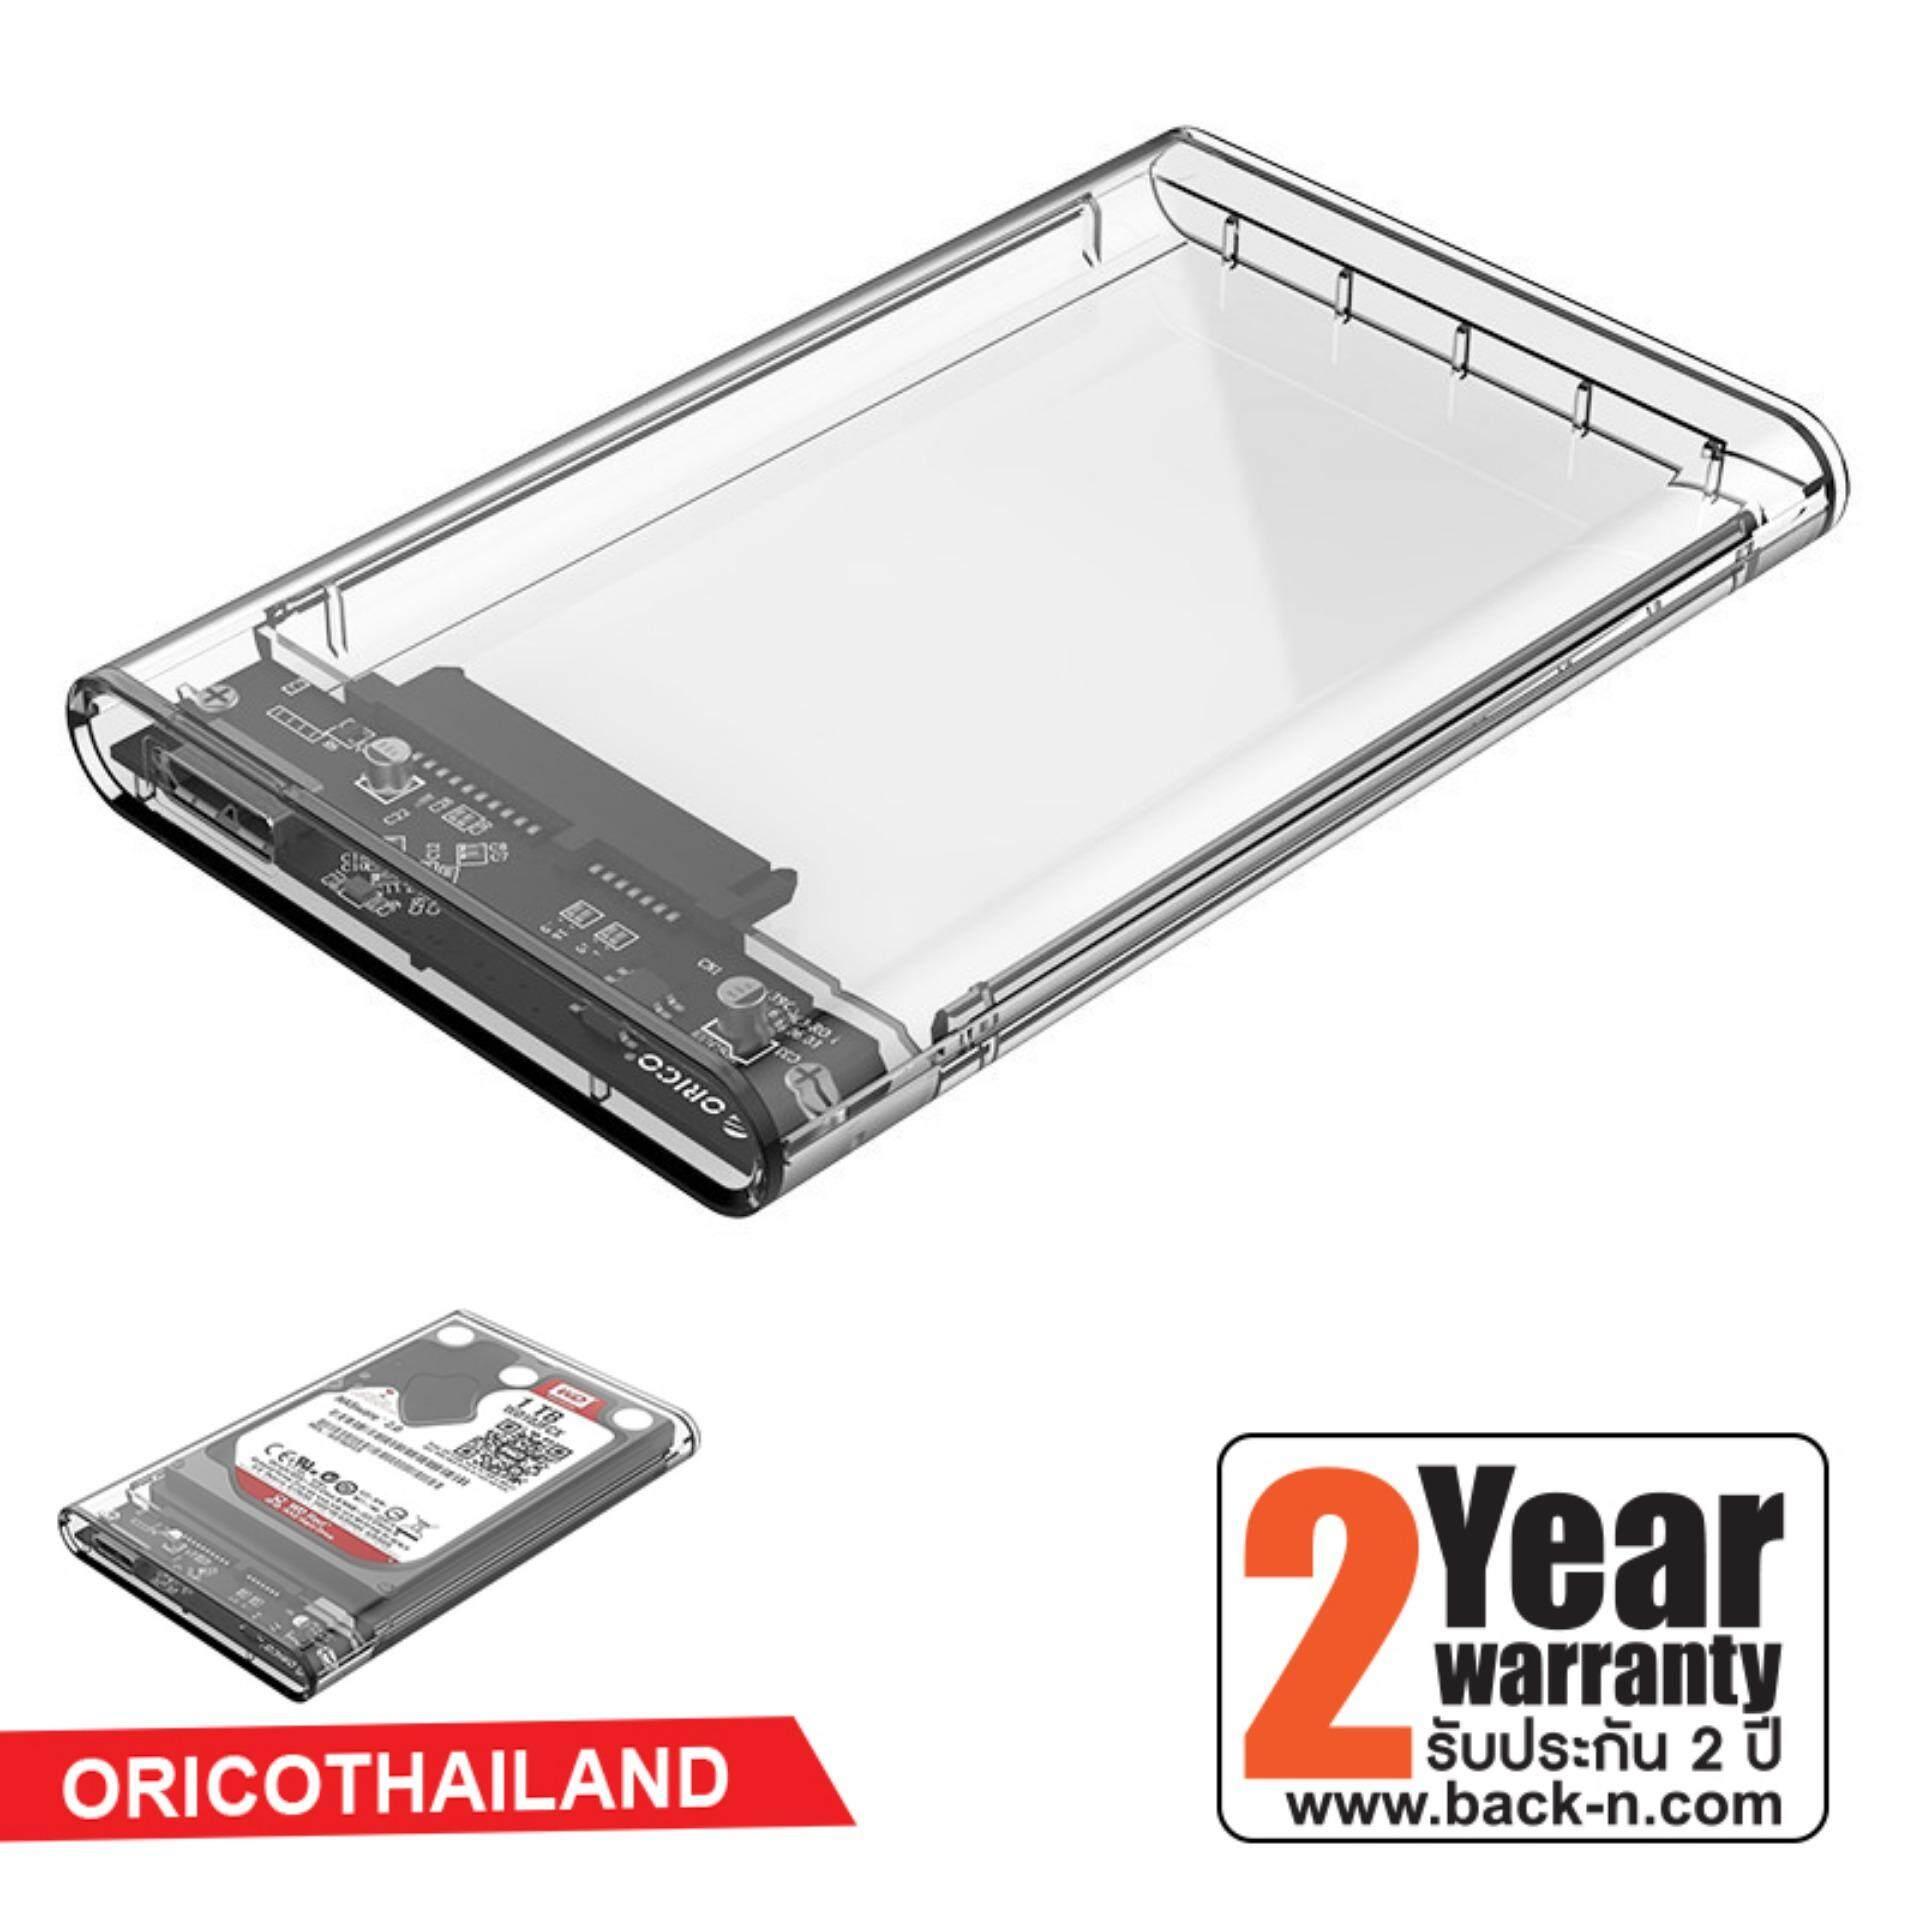 Orico Thailand Phd 25 25inch Hdd And Gadget Protector Enclosure 2139u3 Inch Transparent Usb30